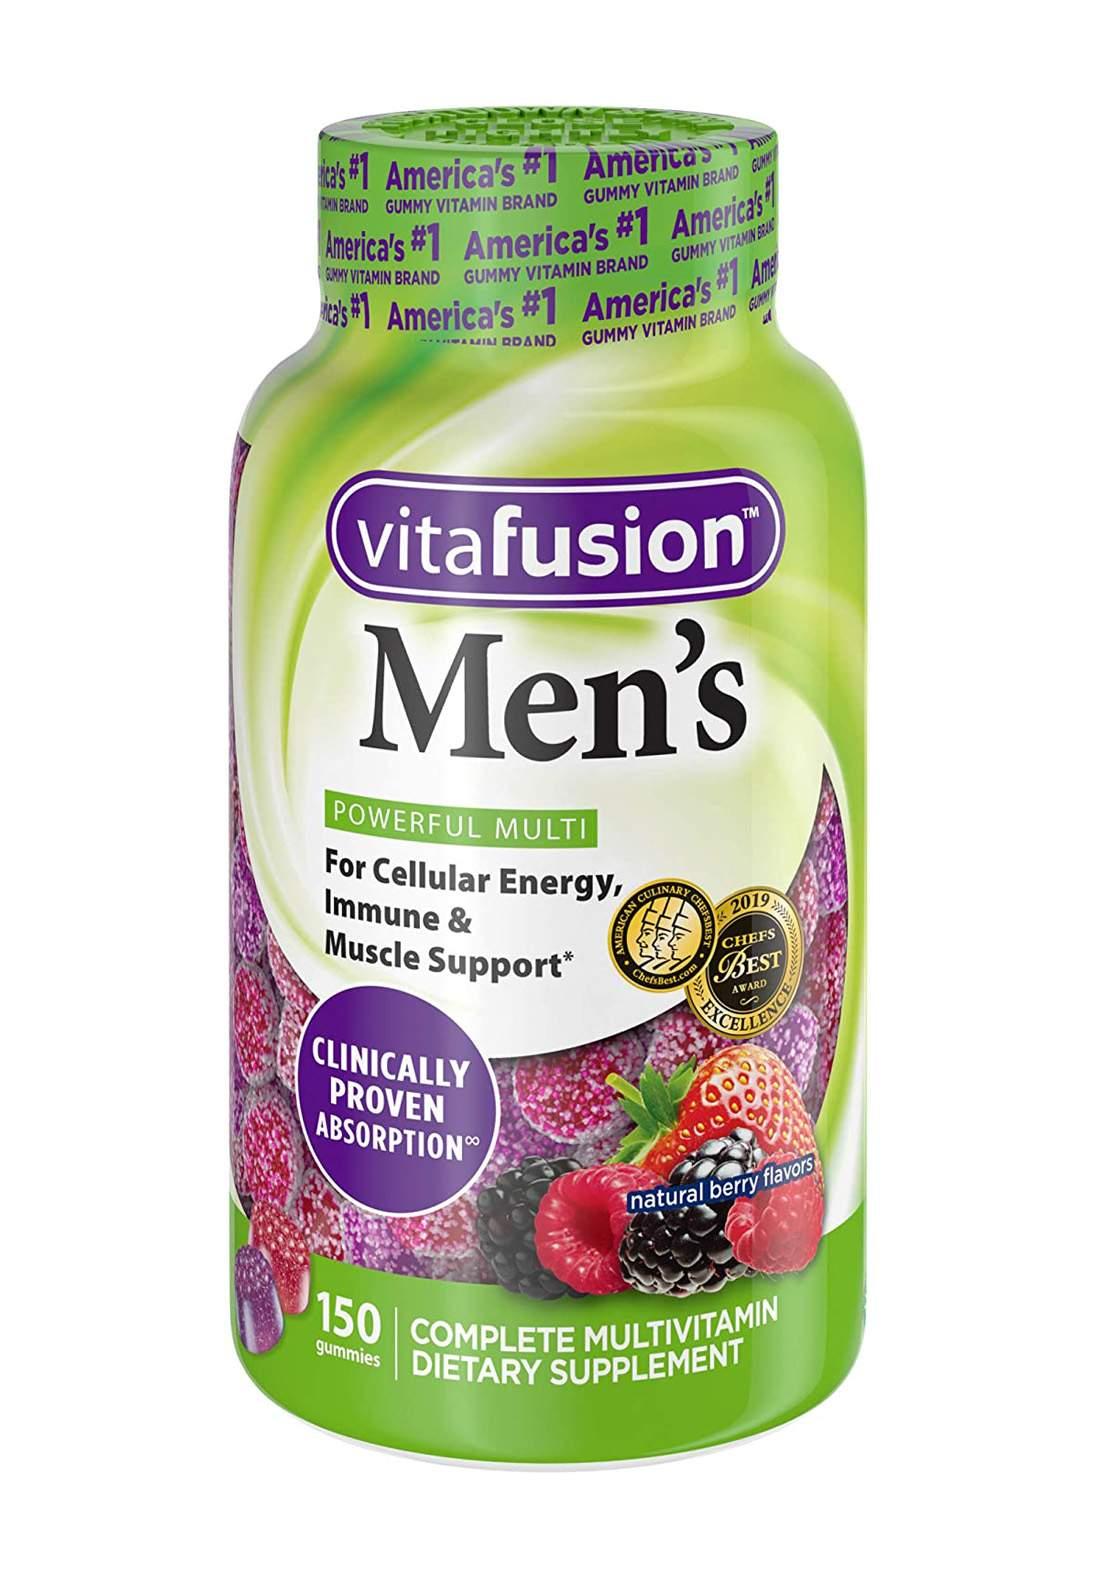 Vitafusion Men's Multivitamin Dietary Supplement 150 Gummies مكمل غذائي